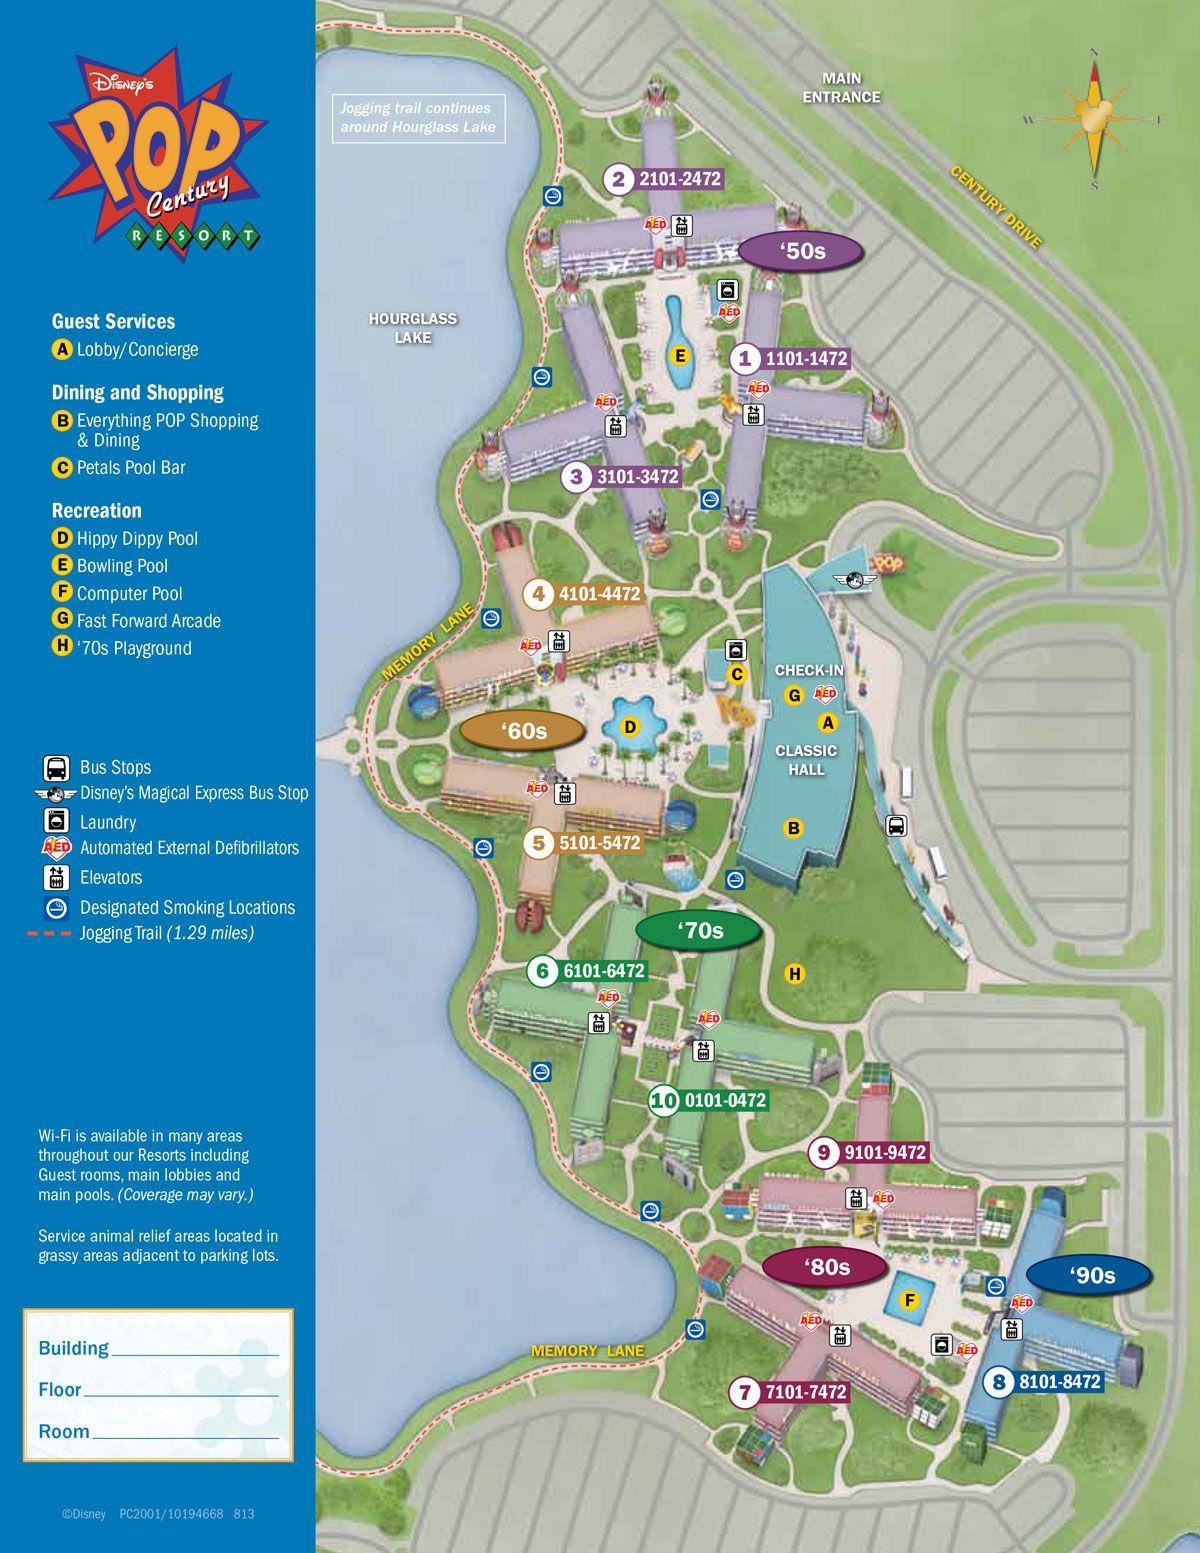 Walt Disney World Pop Century Resort Map